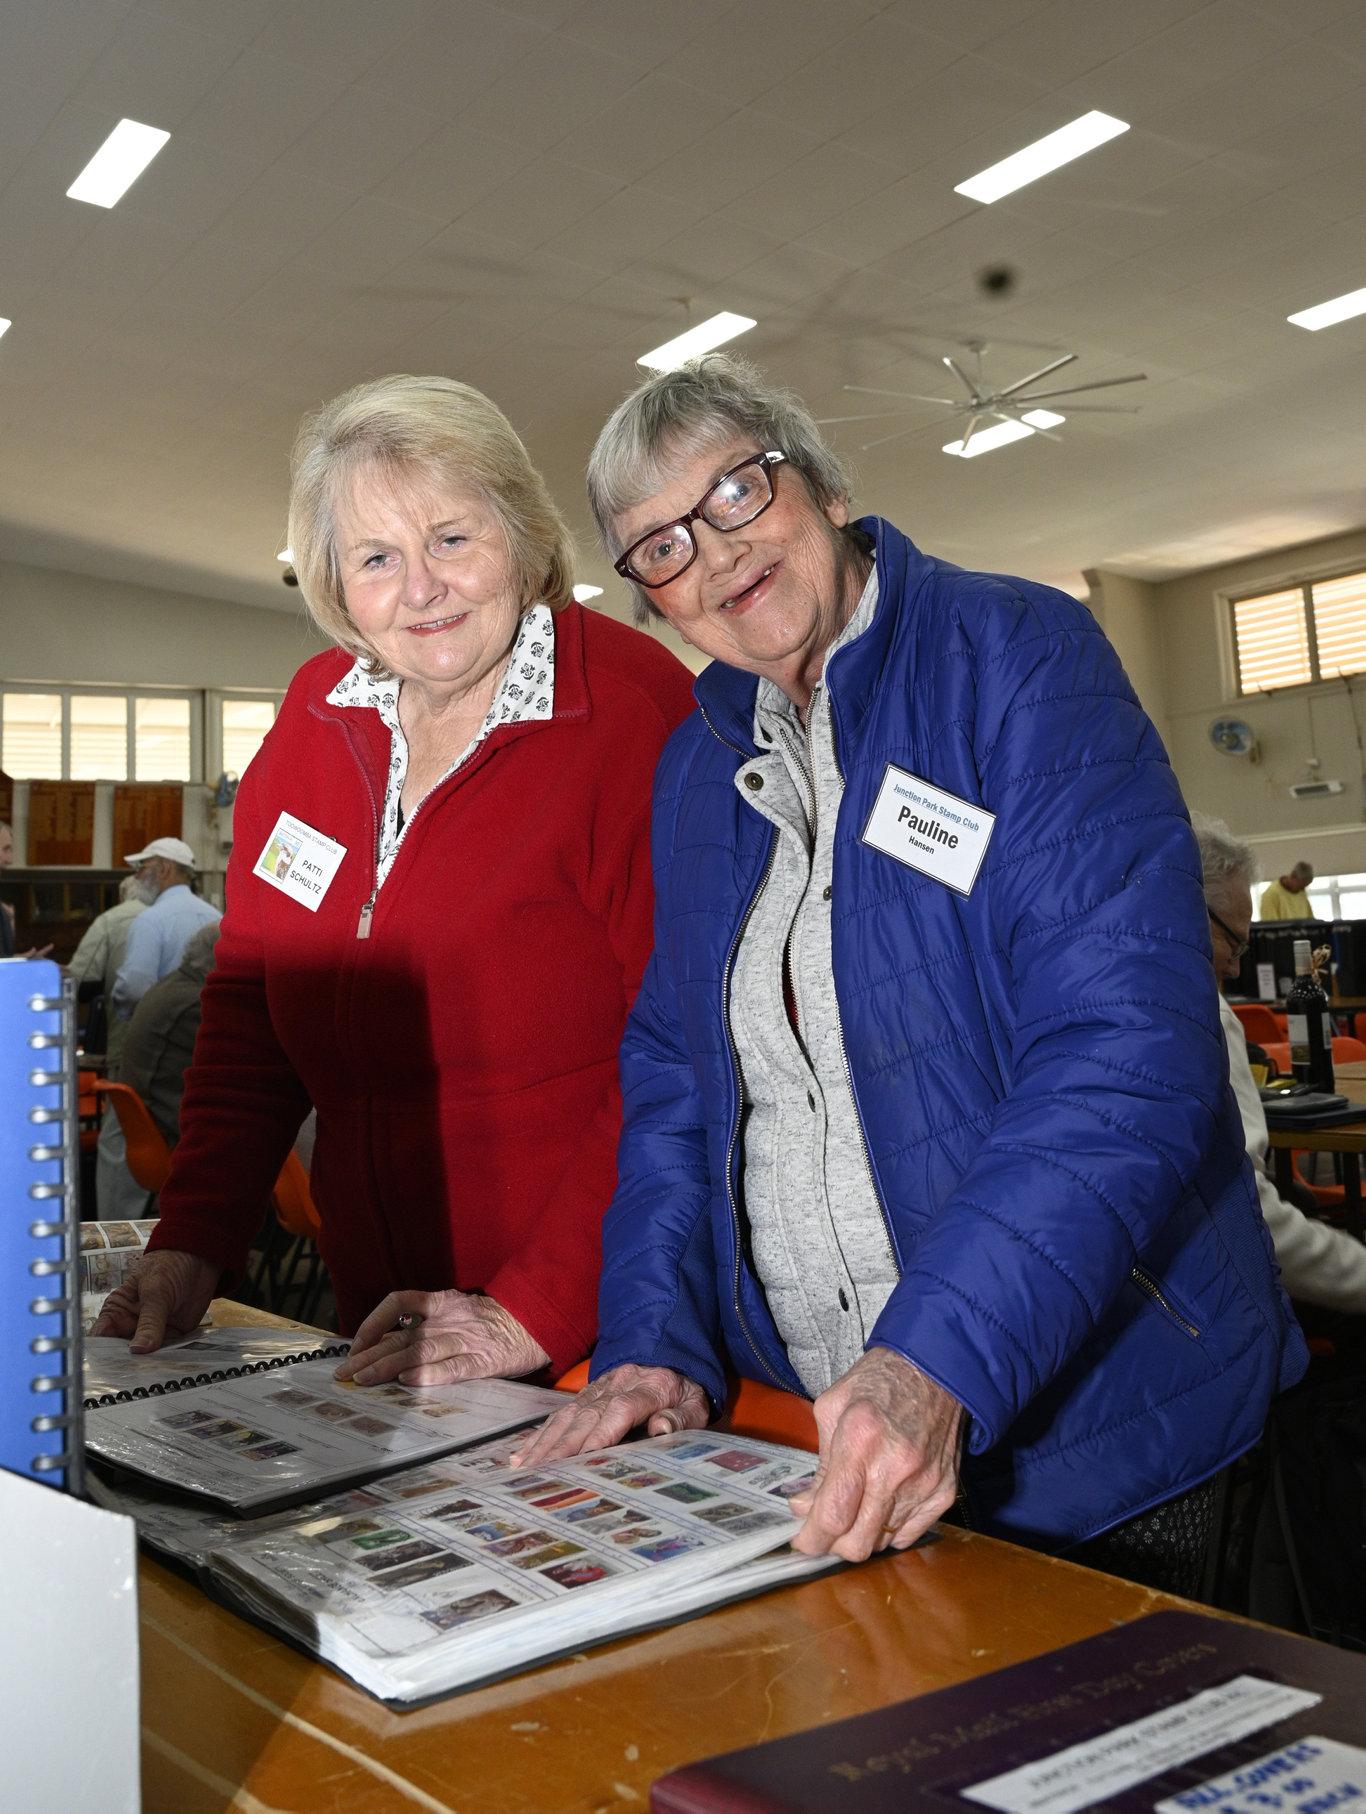 Patti Schultz (left) and Pauline Hansen. Stamp Fair at Indoor Bowls Hall. October 2019 Picture: Bev Lacey